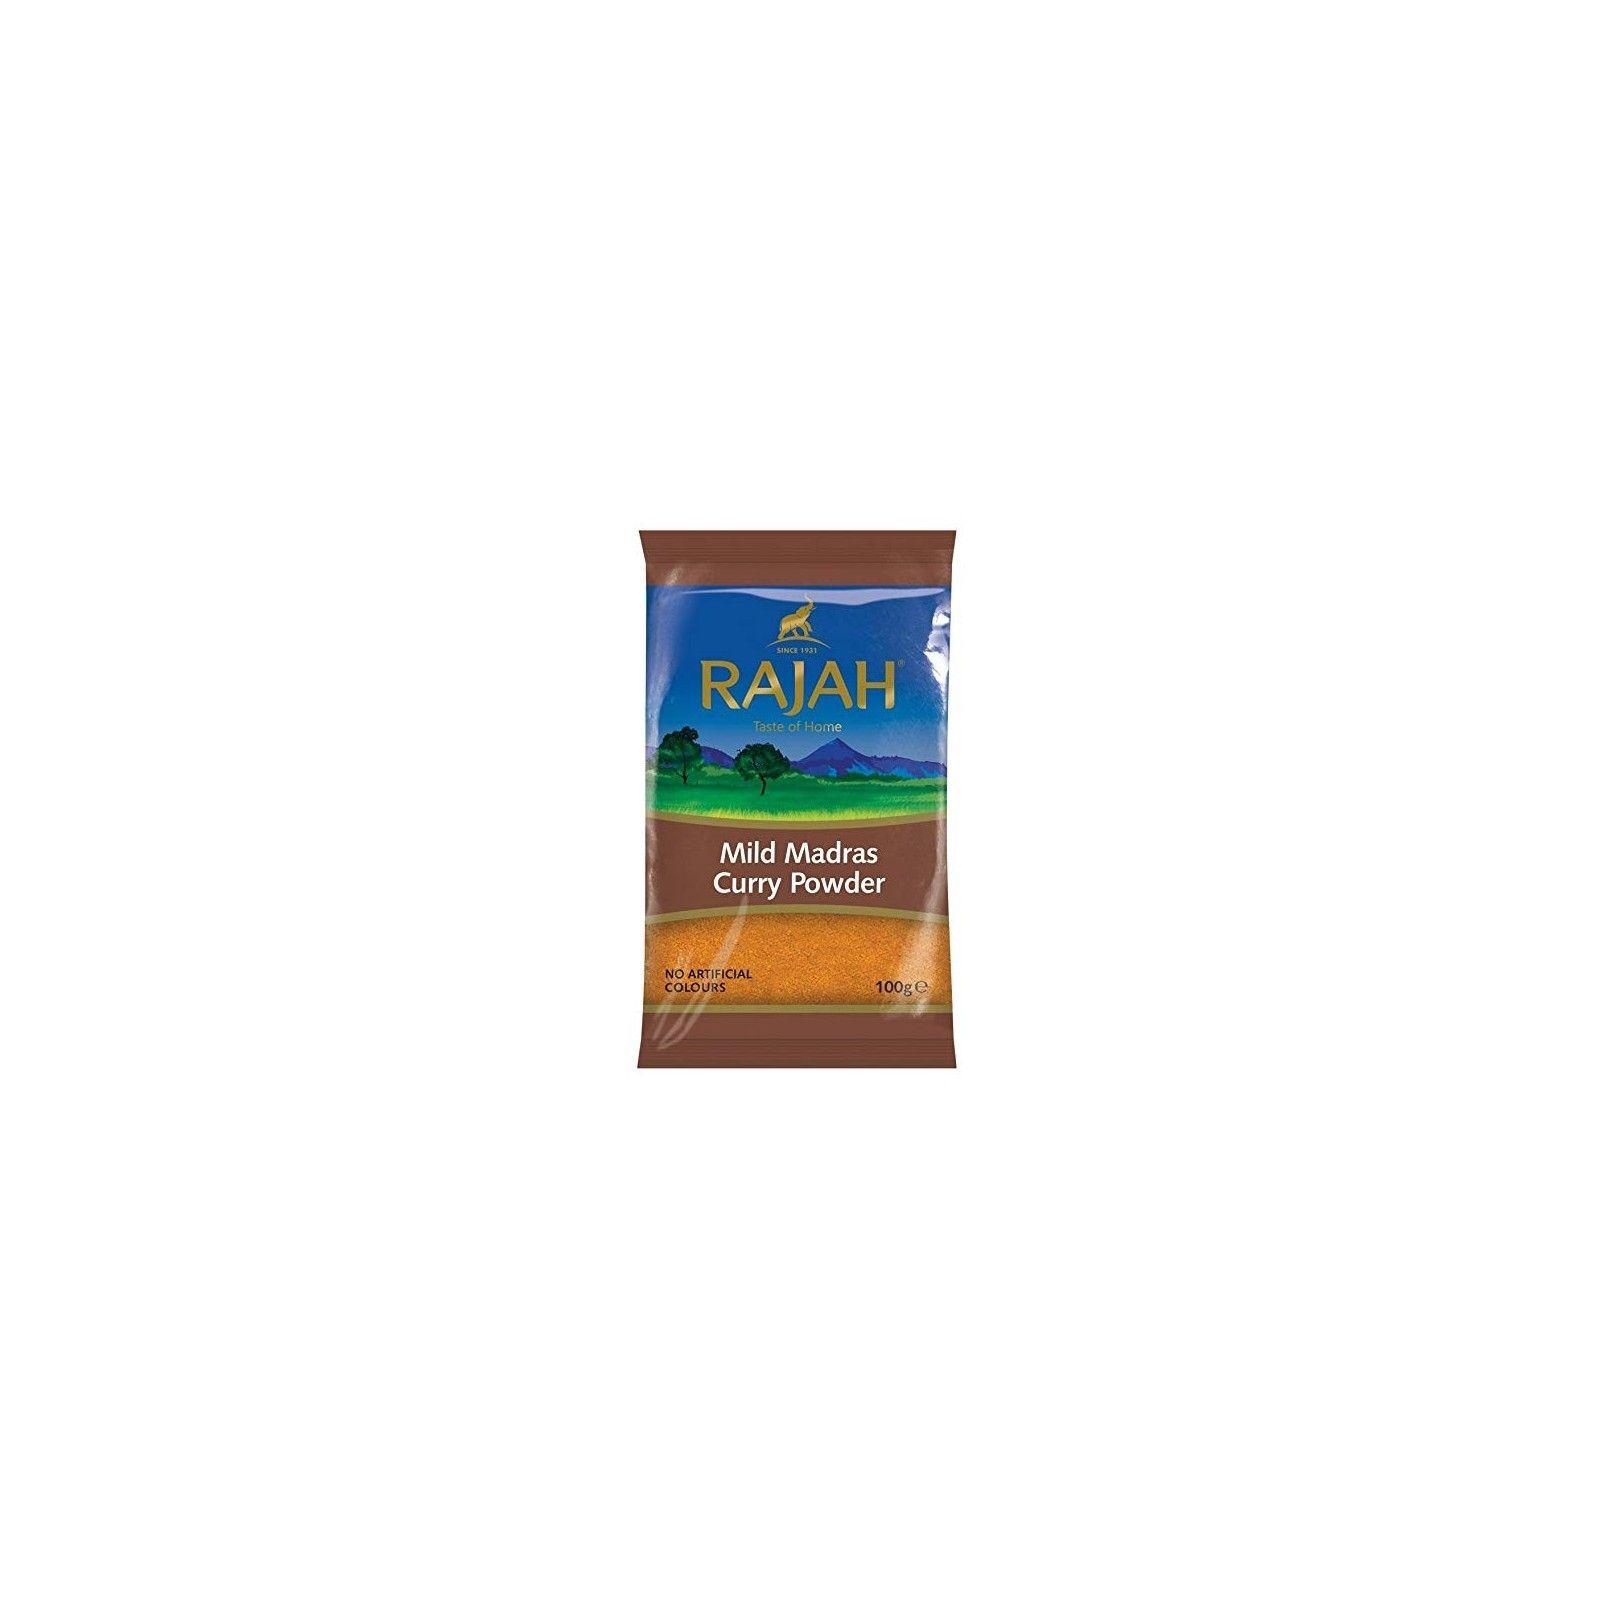 Asia Marché Curry doux Madras Rajah 100g